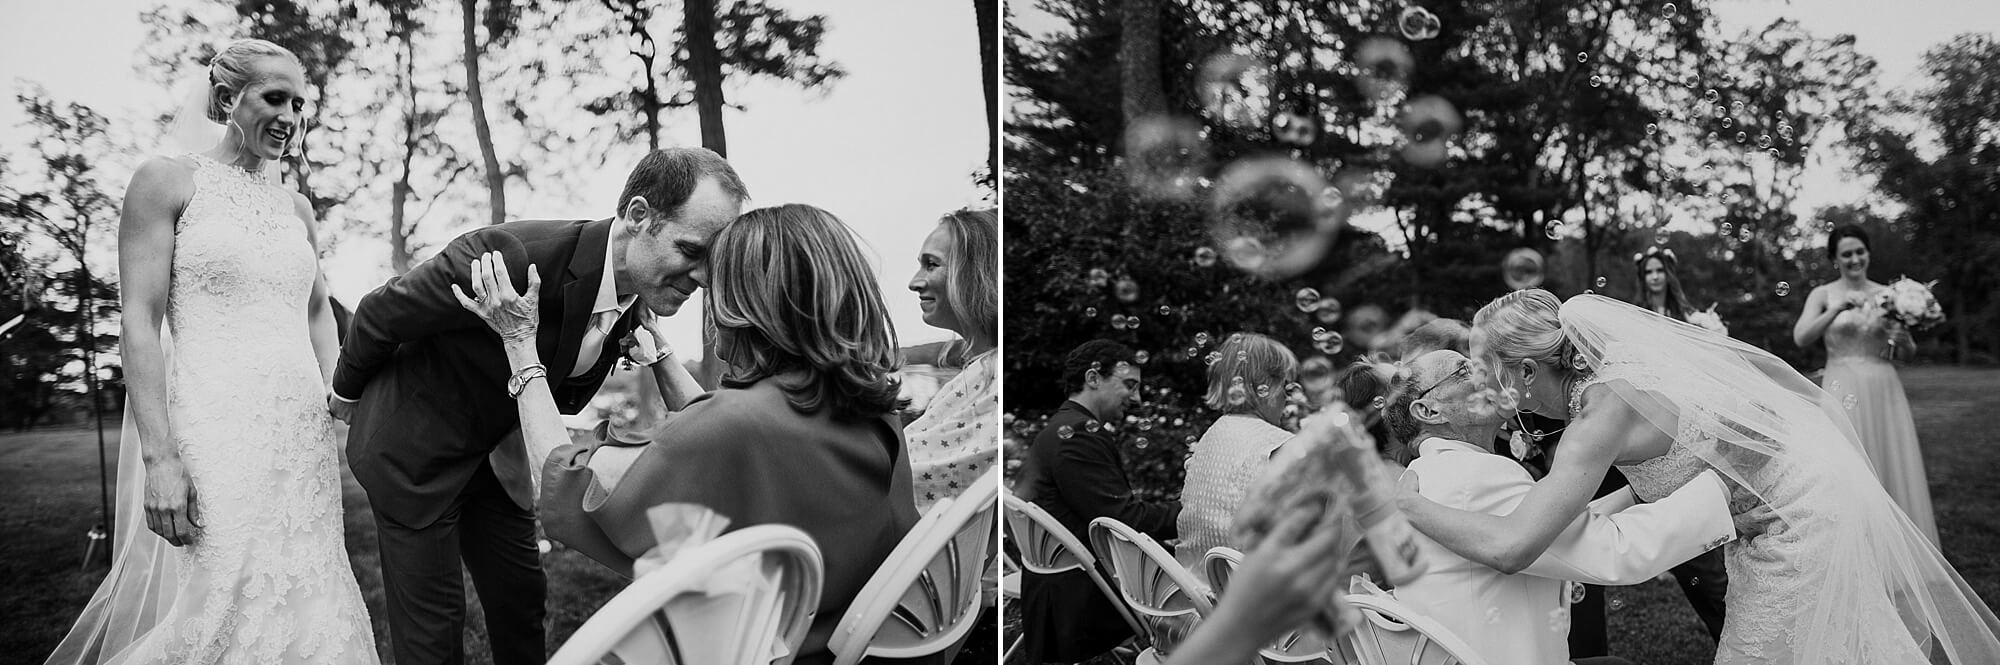 Backyard Wedding - MA_0042.jpg